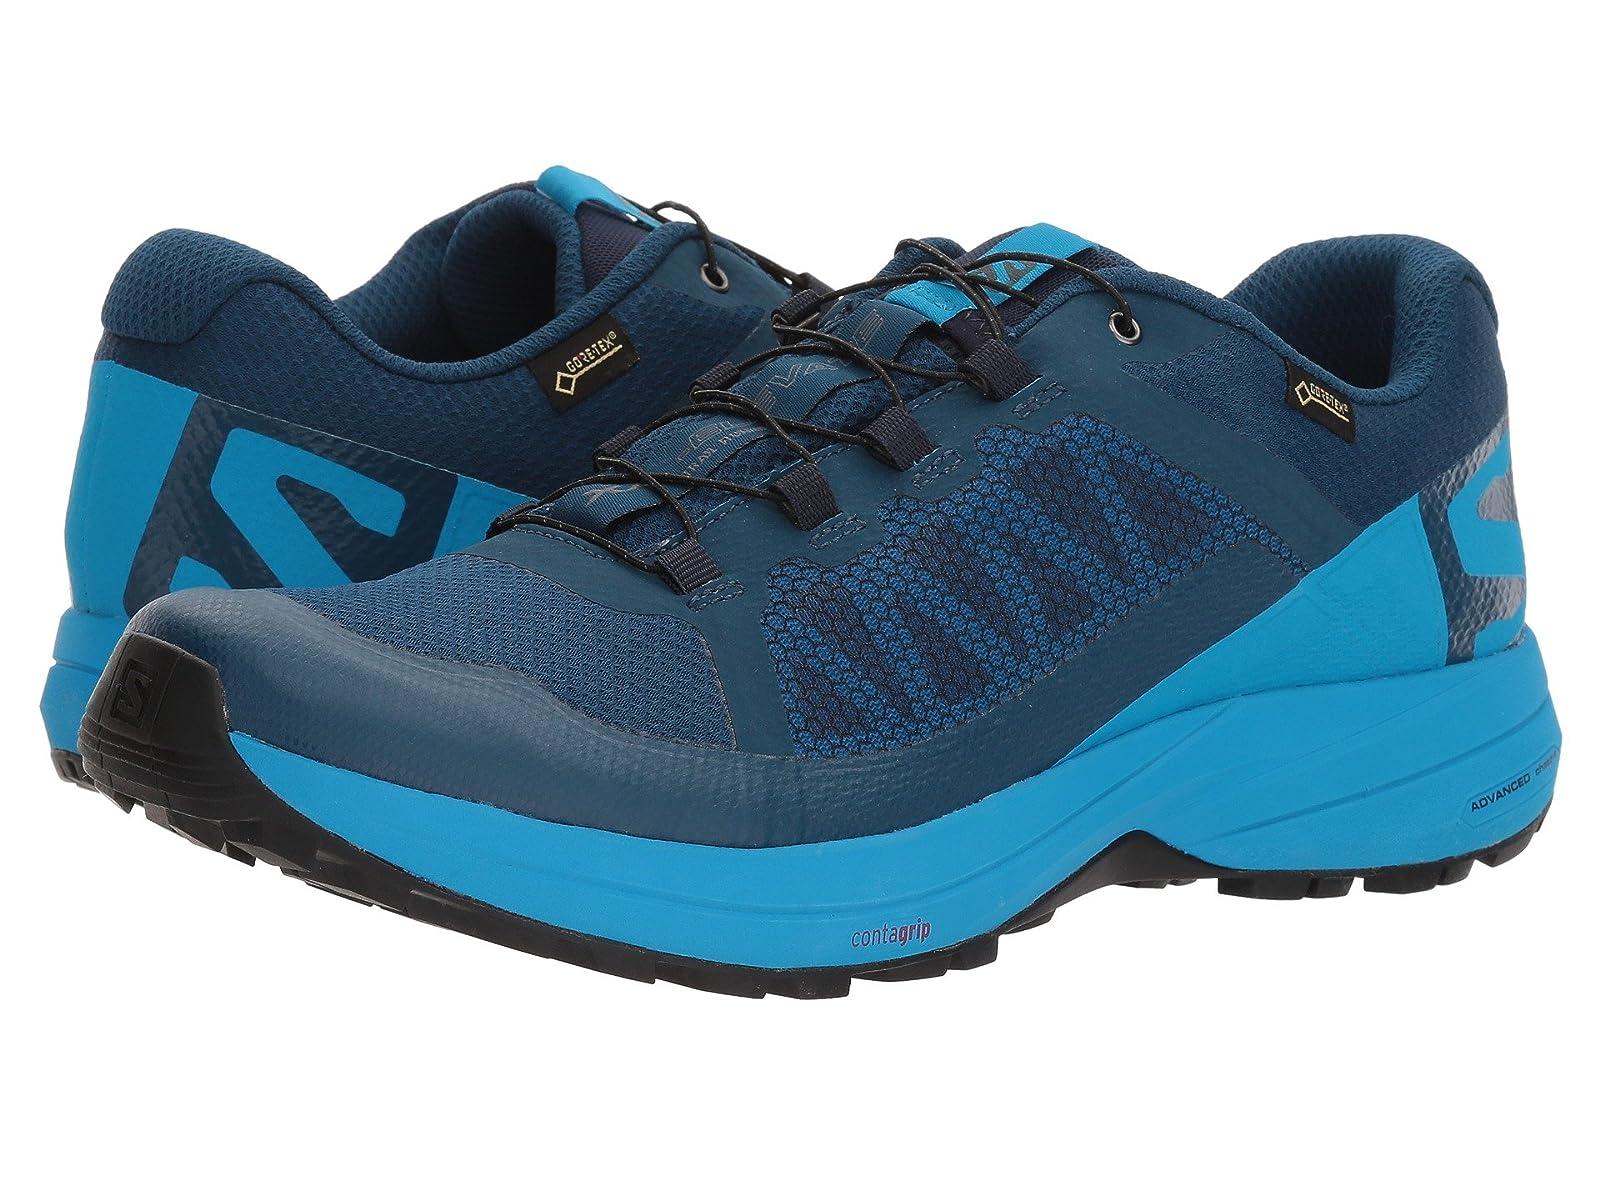 Salomon XA Elevate GTX®Atmospheric grades have affordable shoes